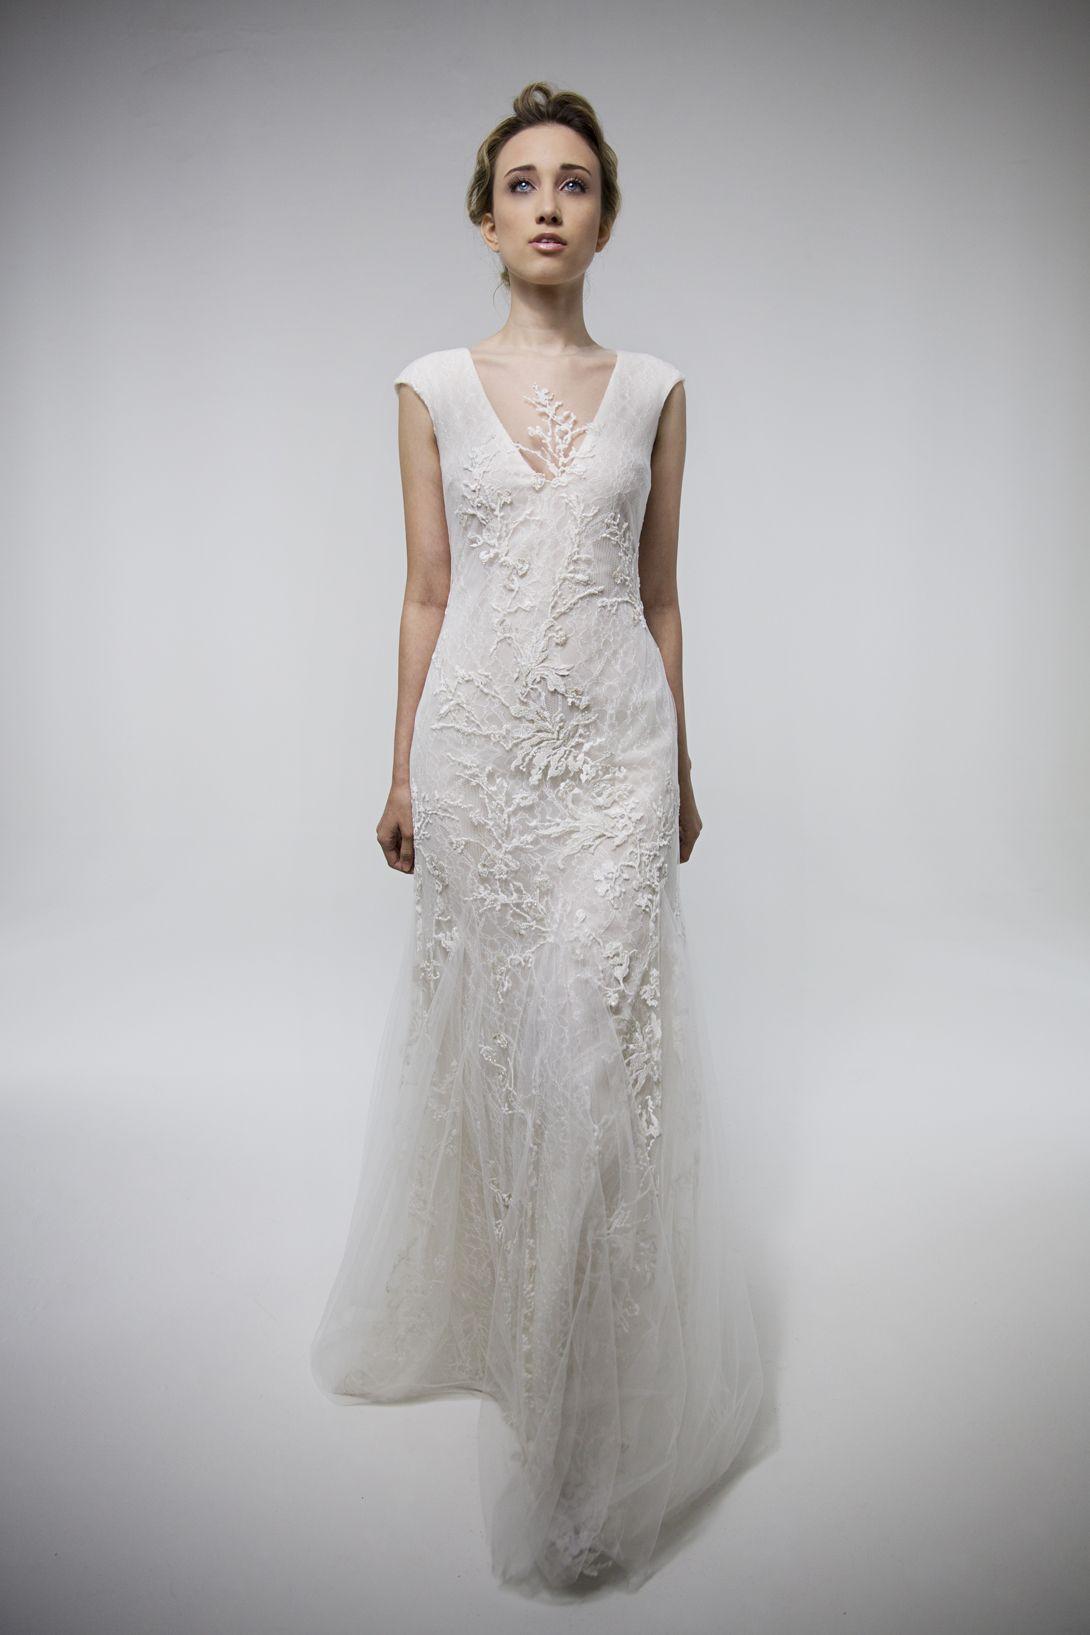 Diana francesmiranda wedding dress yaull done got me in the